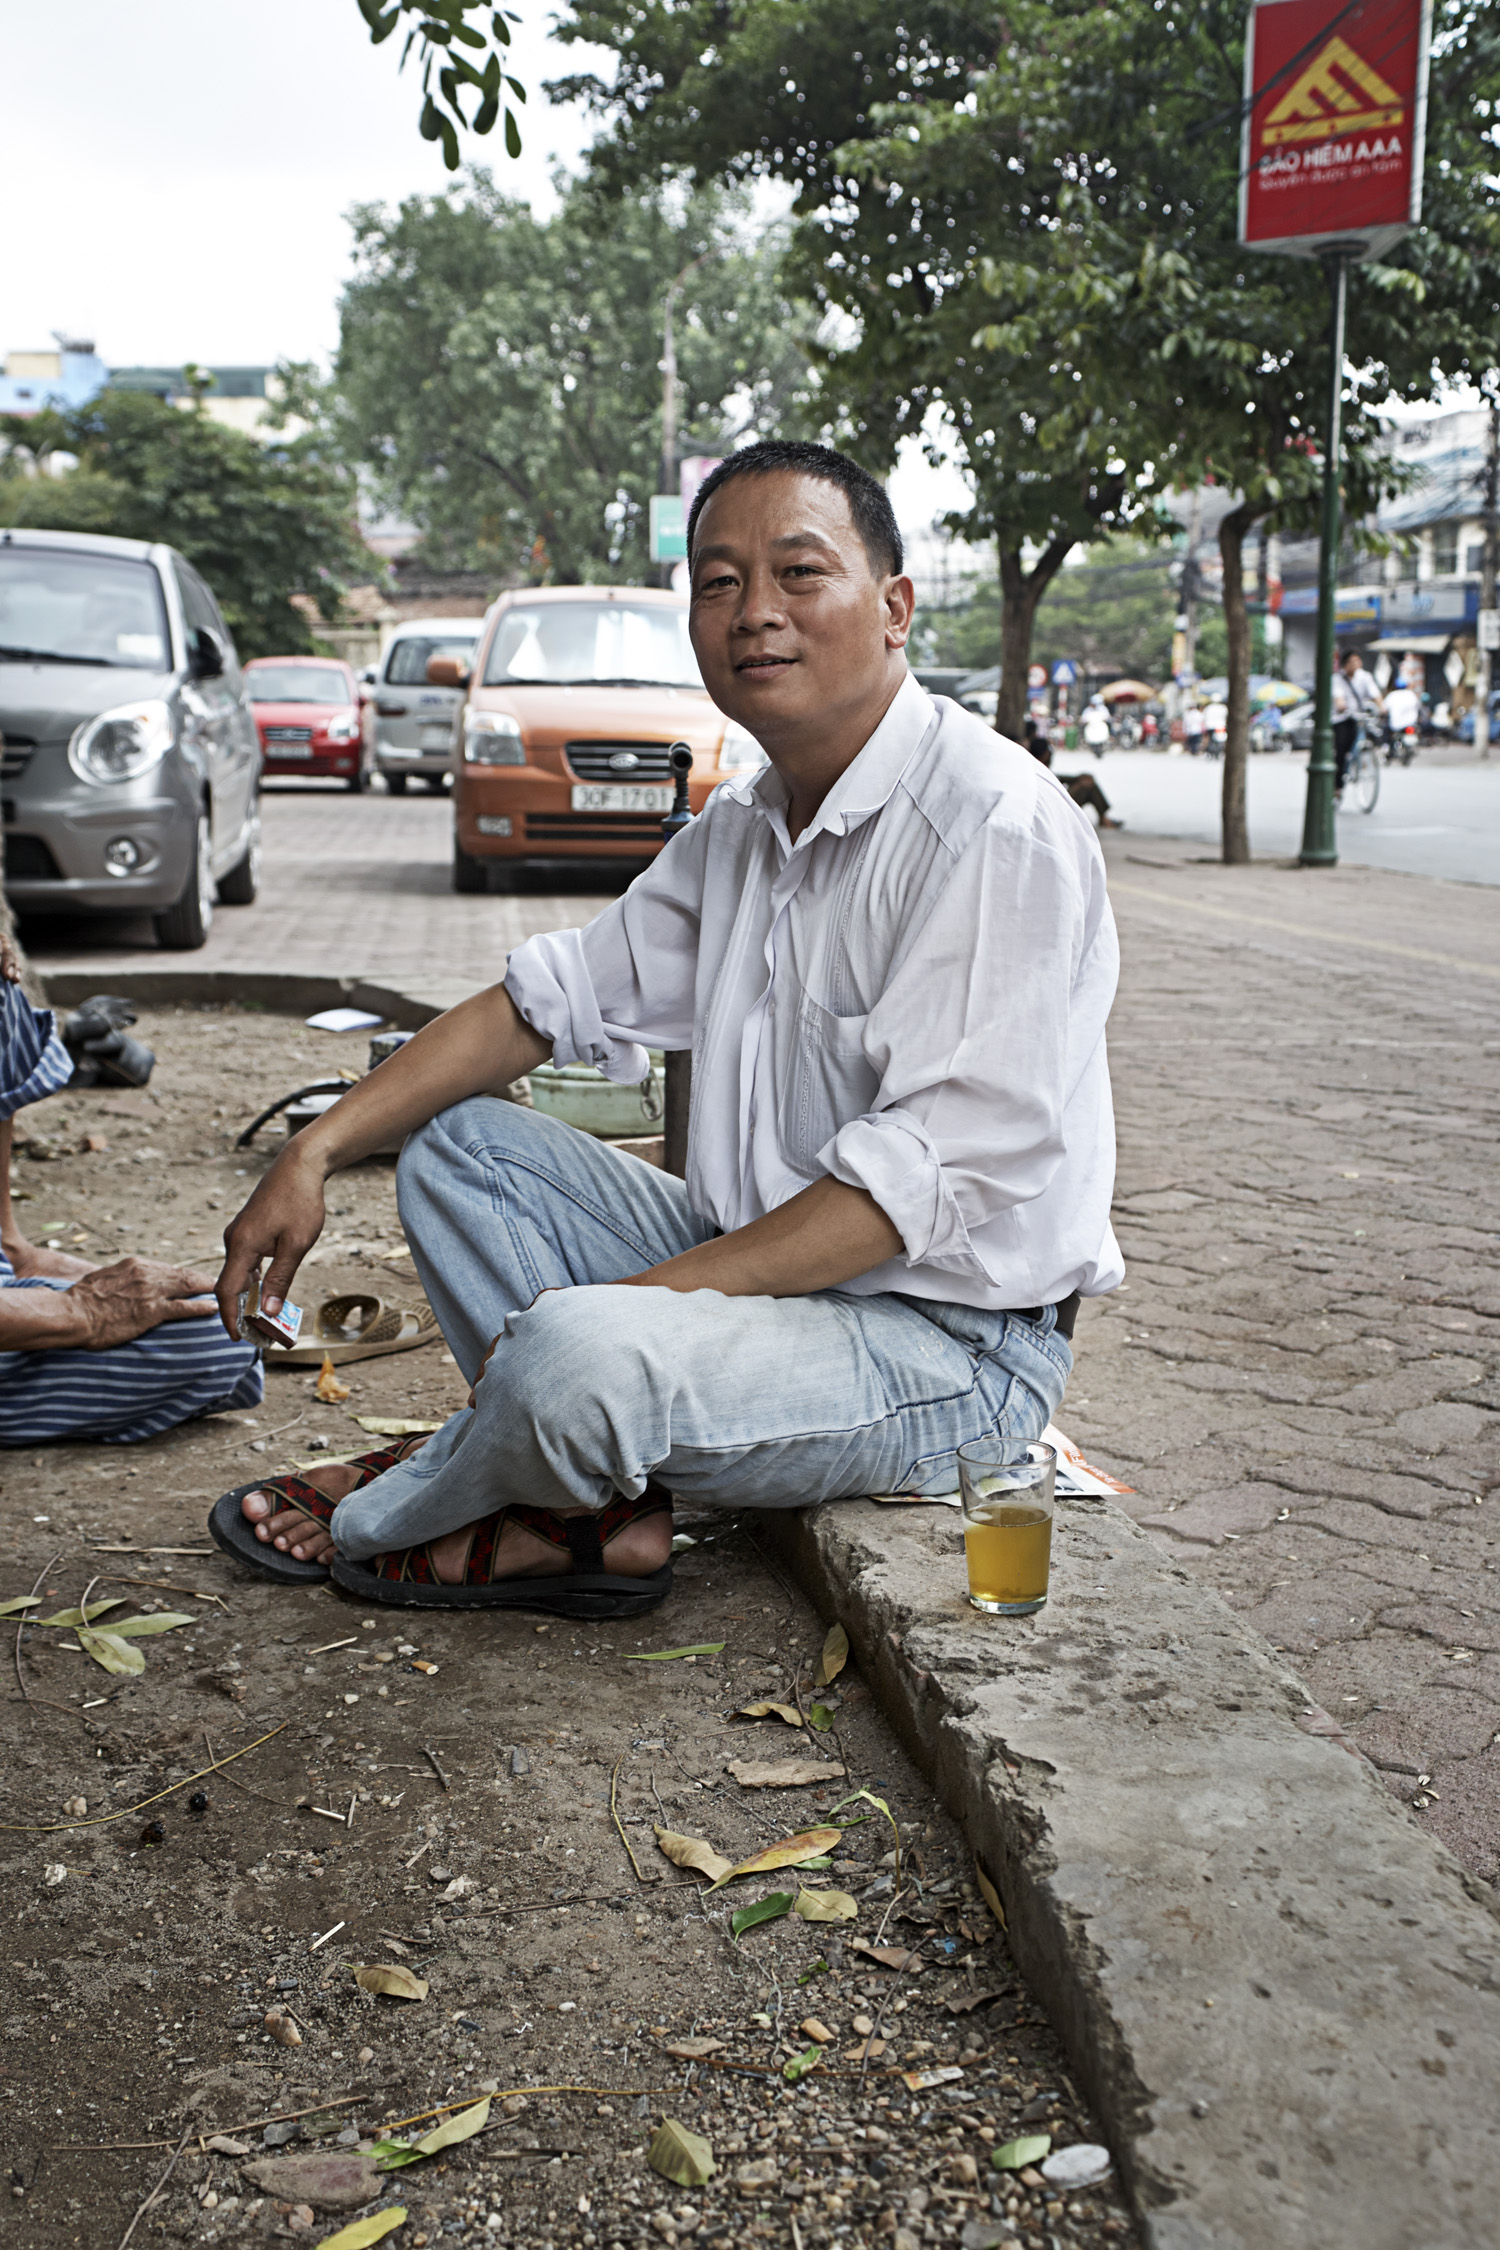 Hanoi 8.5.08-000155